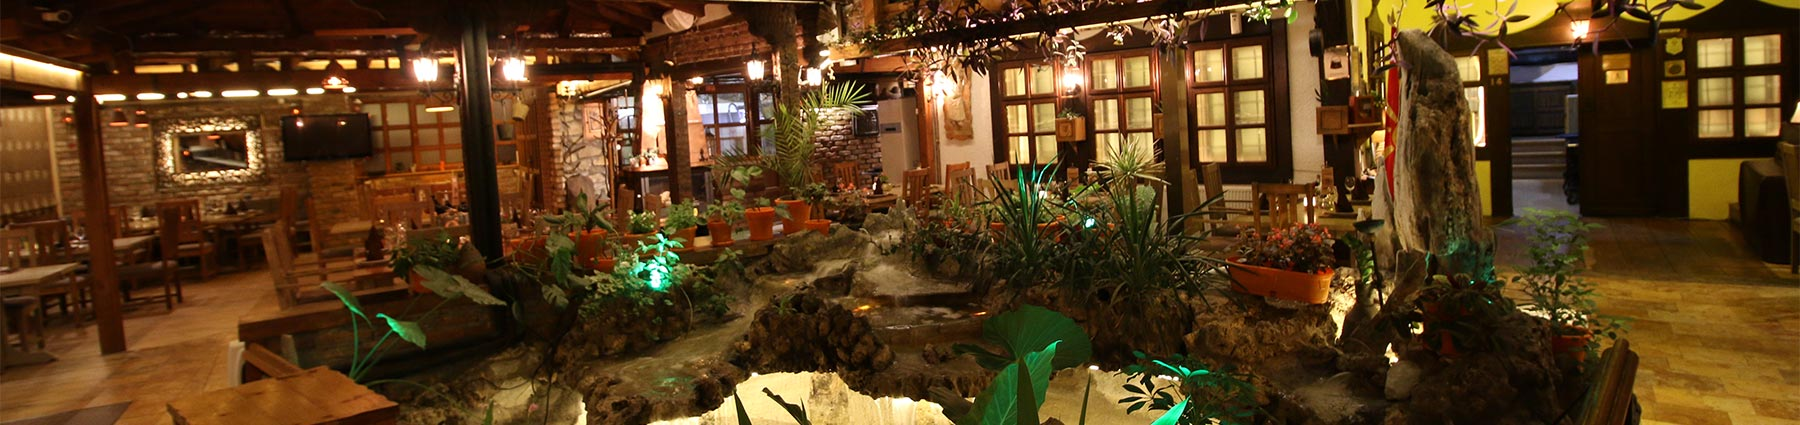 Ресторан Стара Куќа